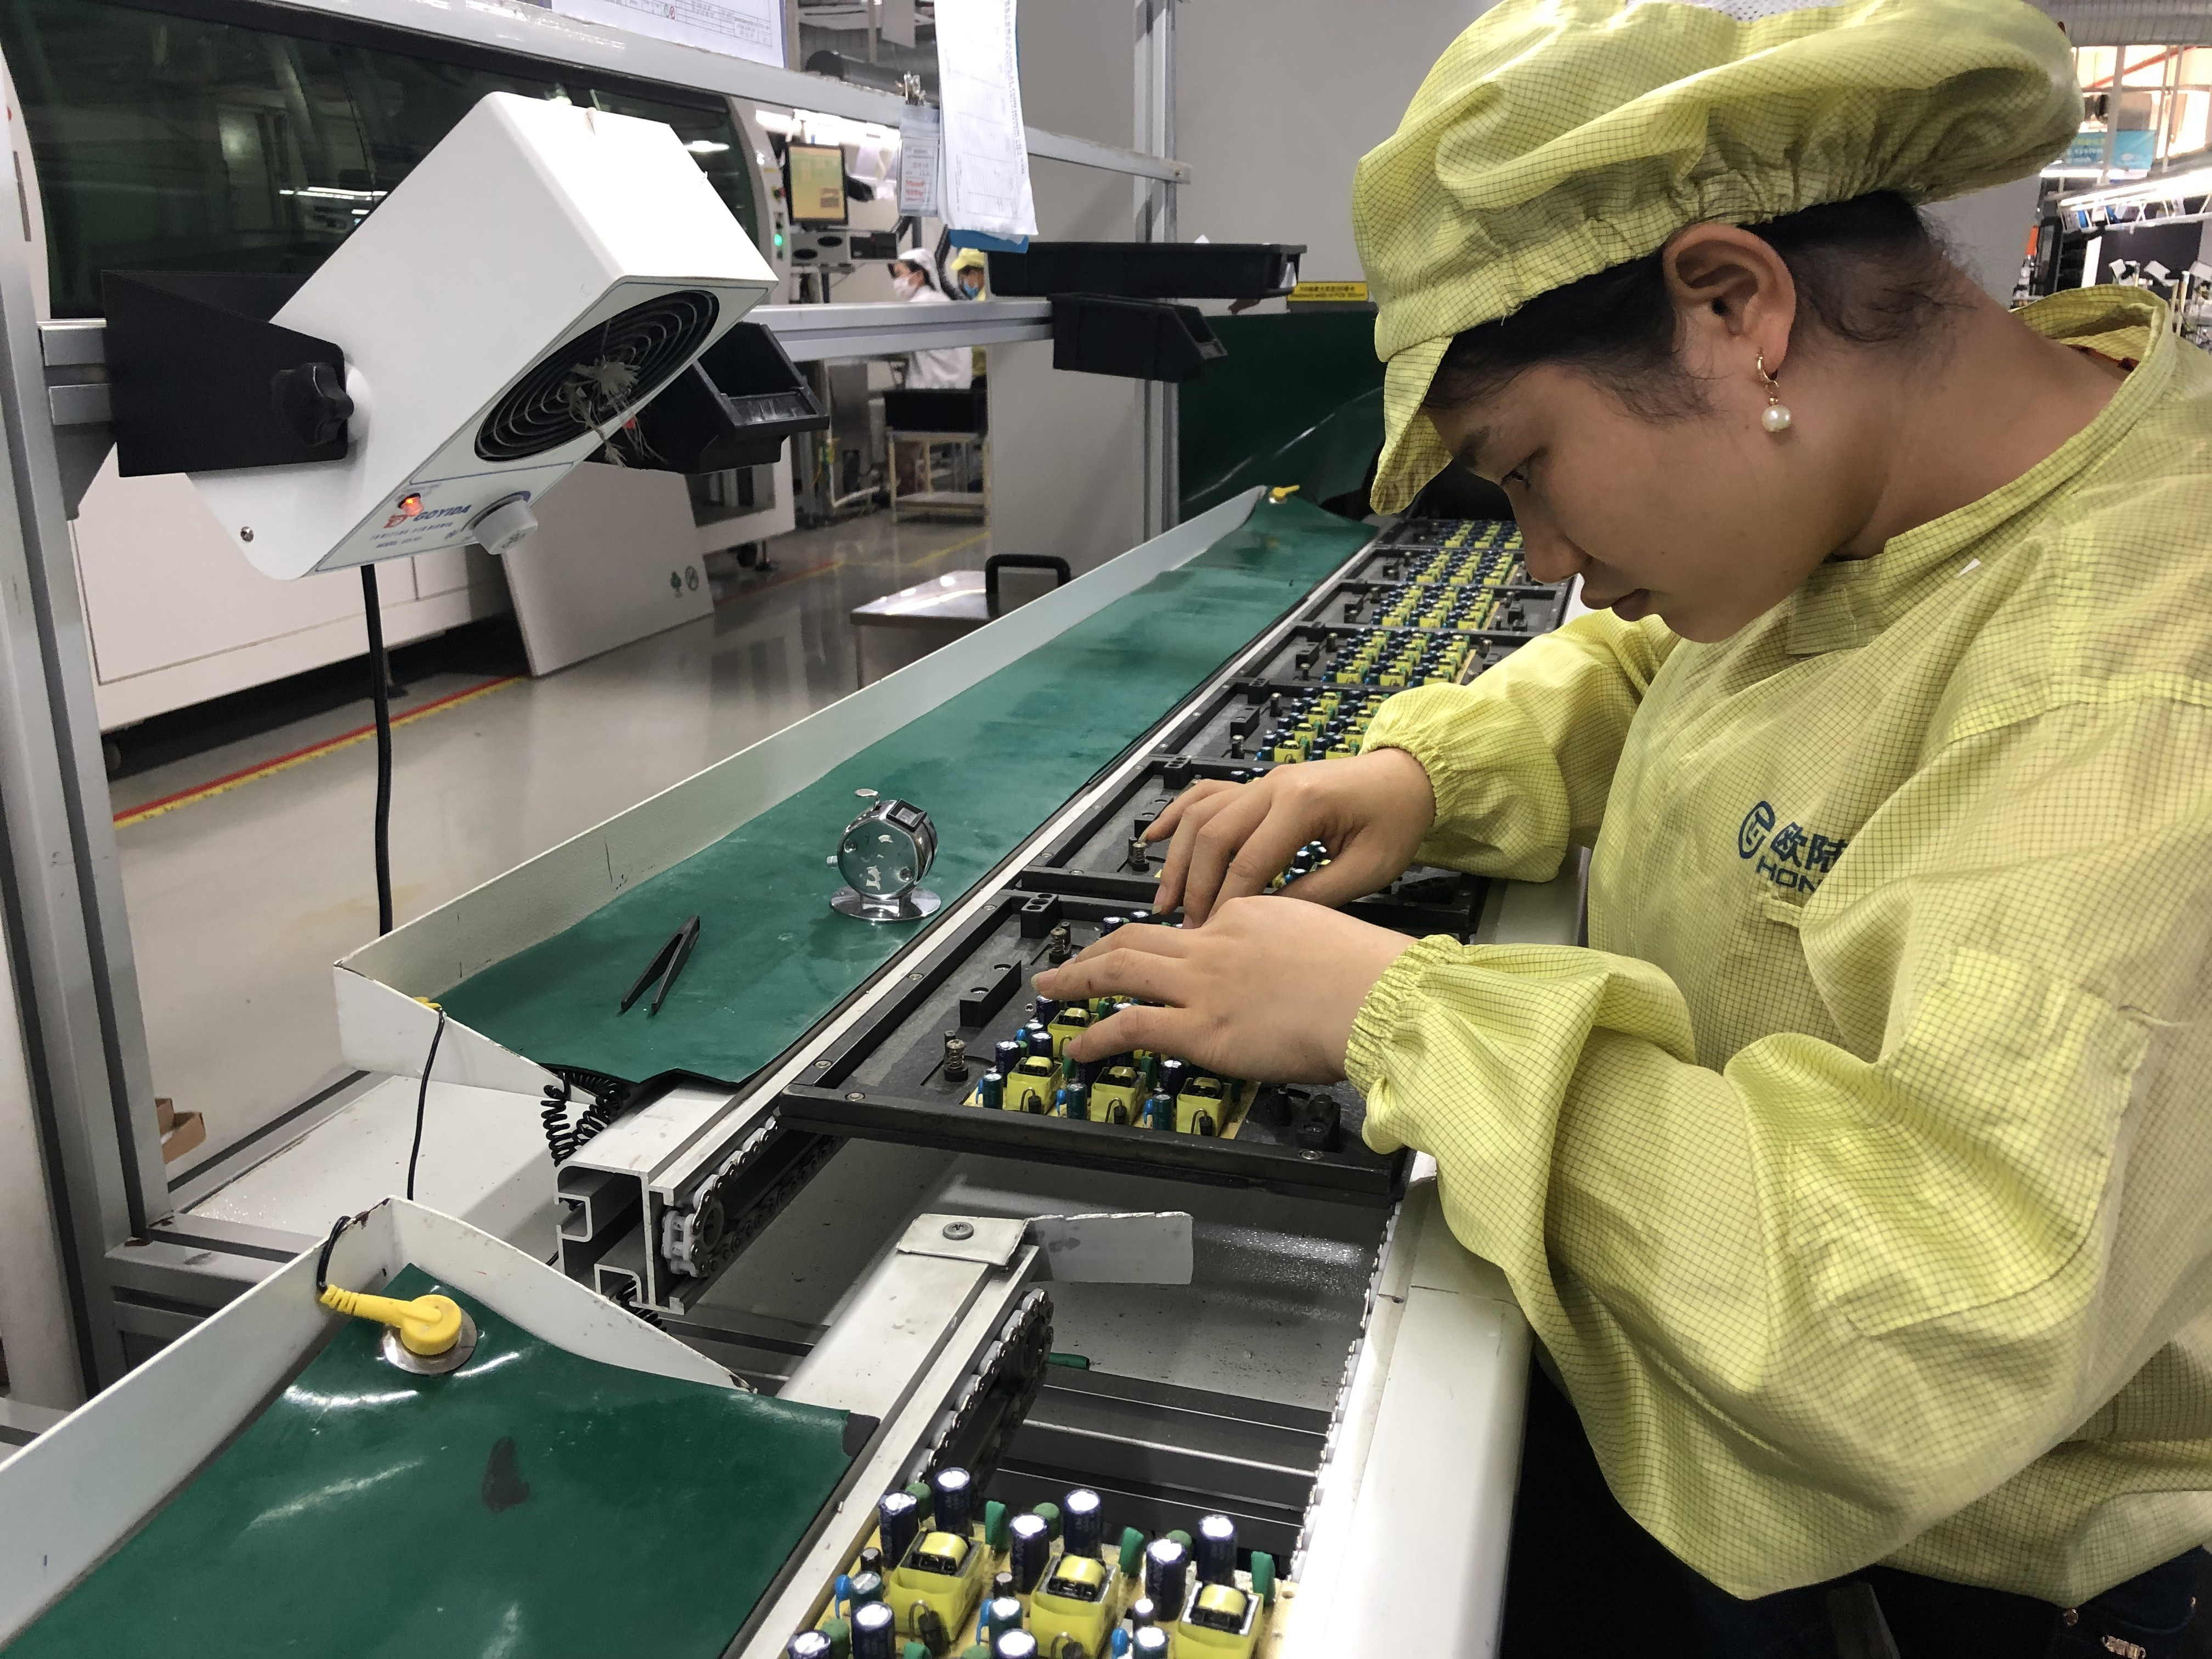 Samsung's last China smartphone factory closing, raising questions